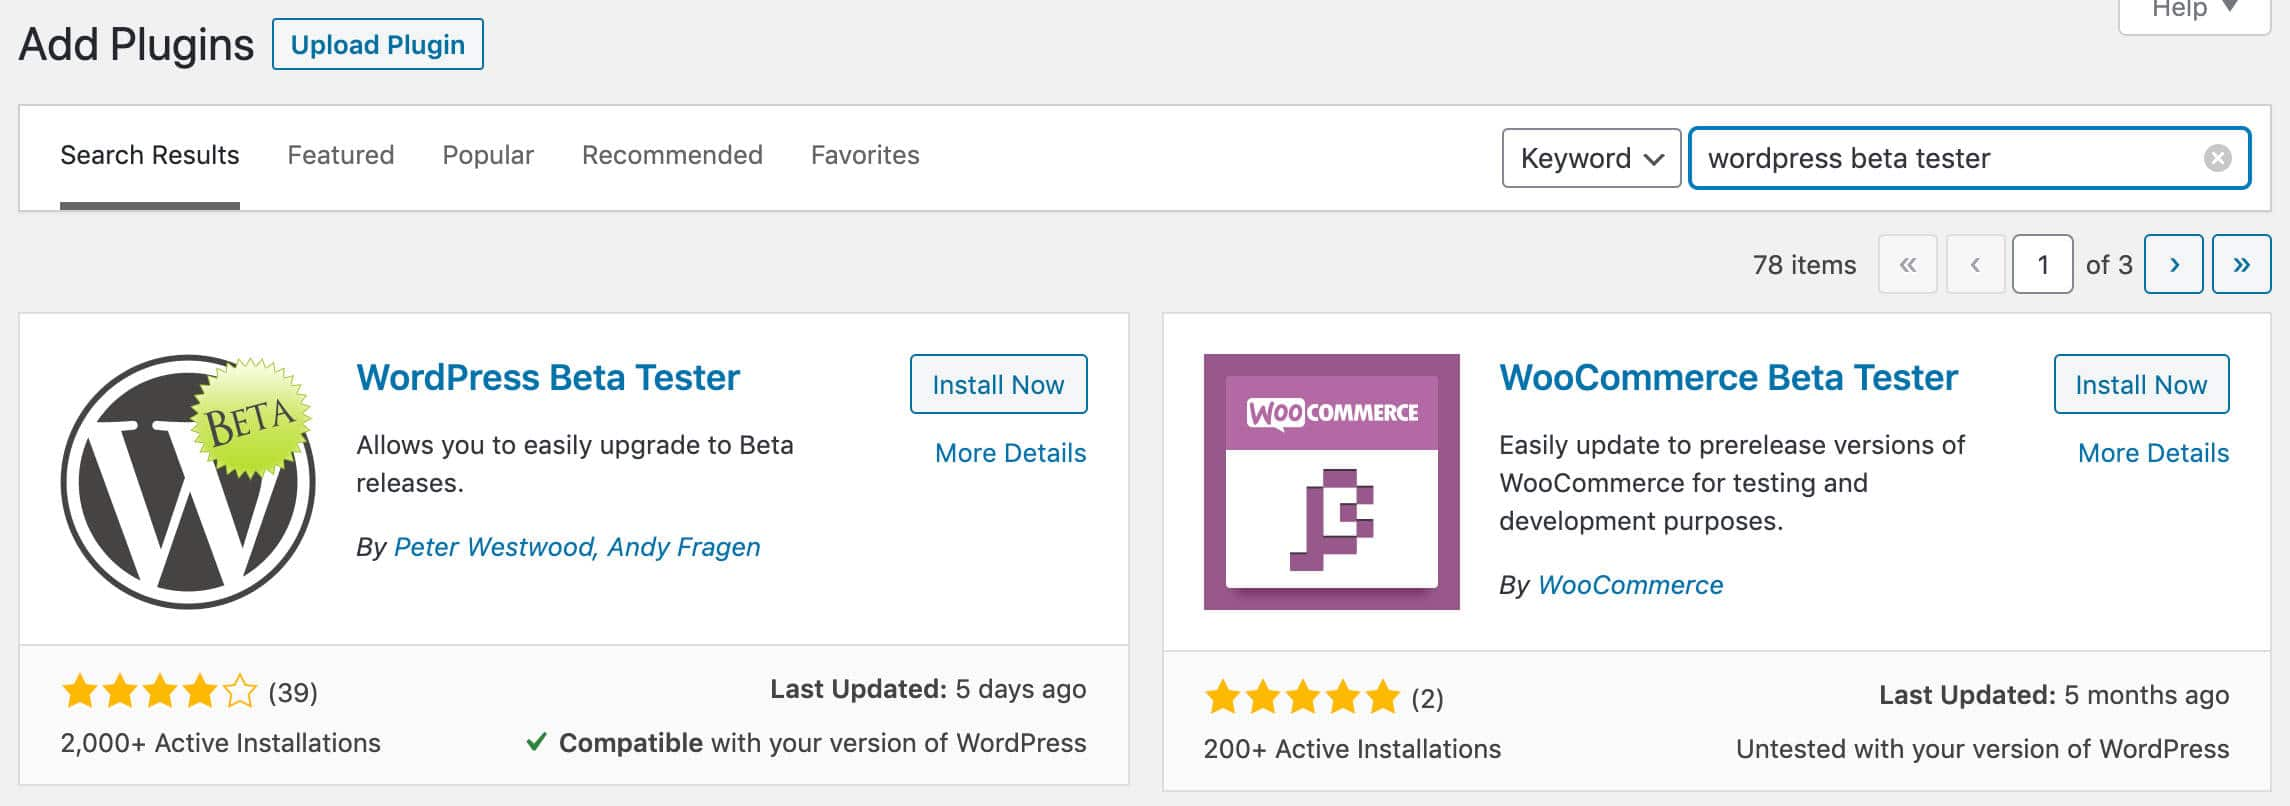 Installare il plugin WordPress Beta Tester